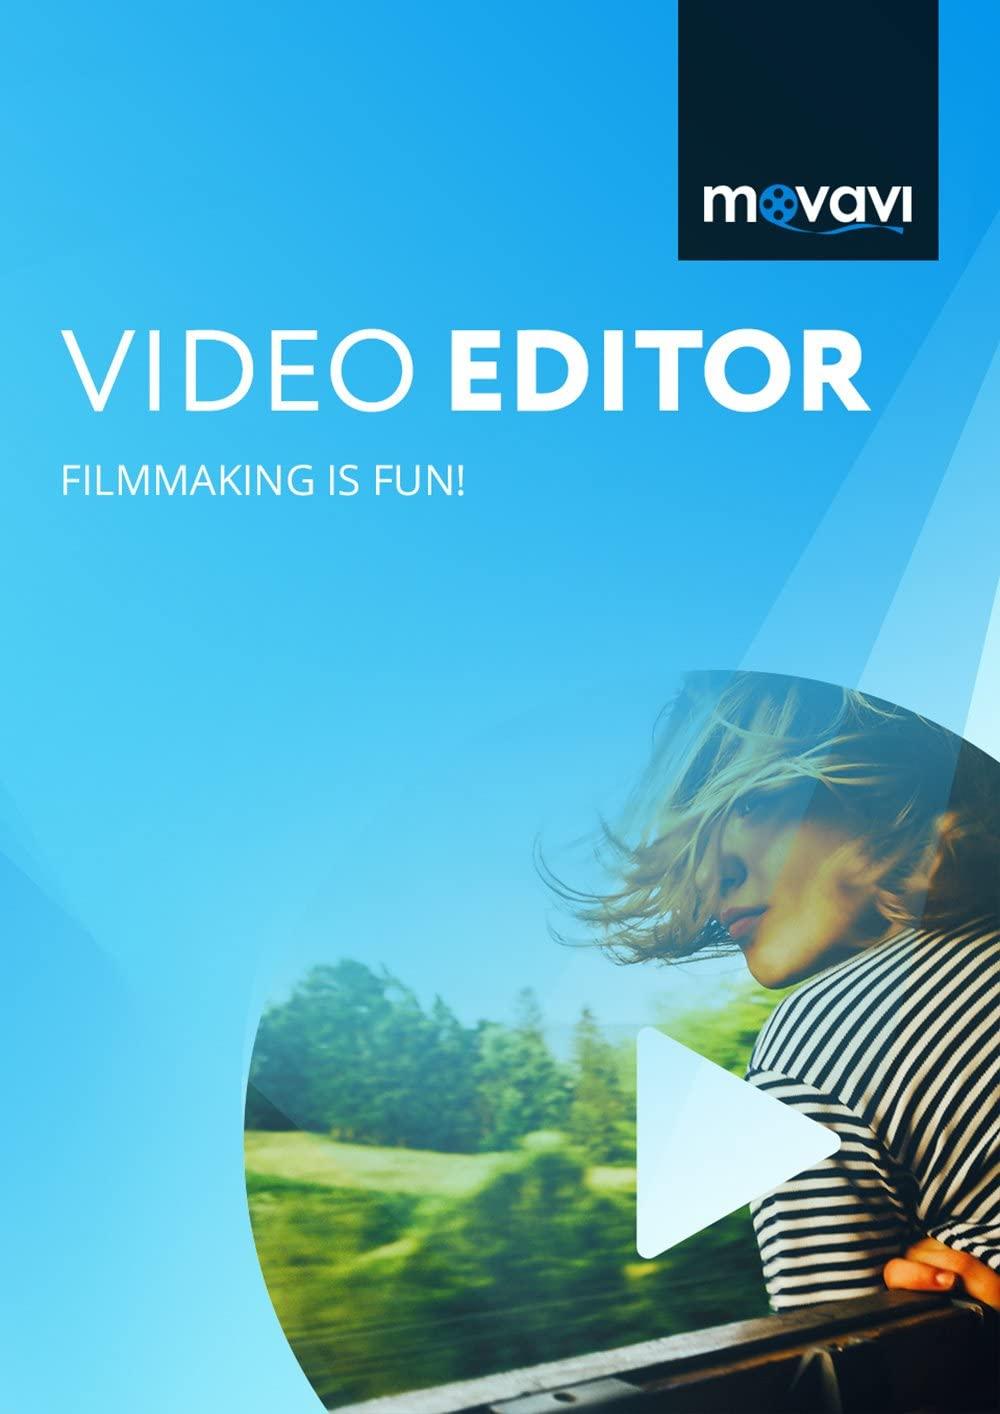 Movavi Video Editor 21.1.0 + Activation Key Free Download 2021